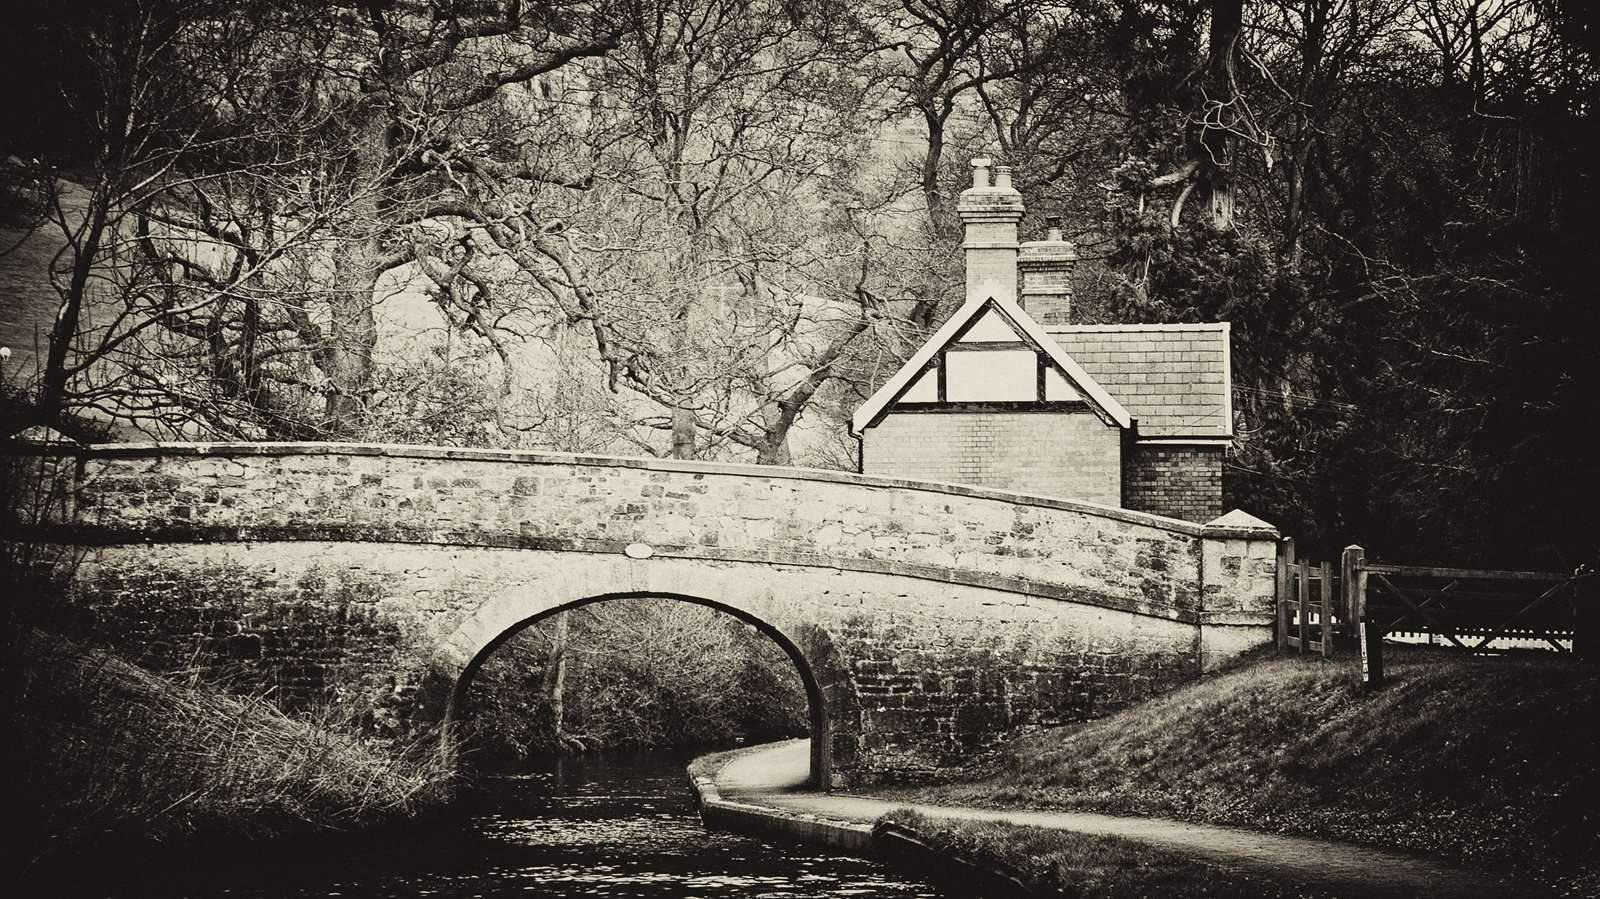 Black and white bridge and house